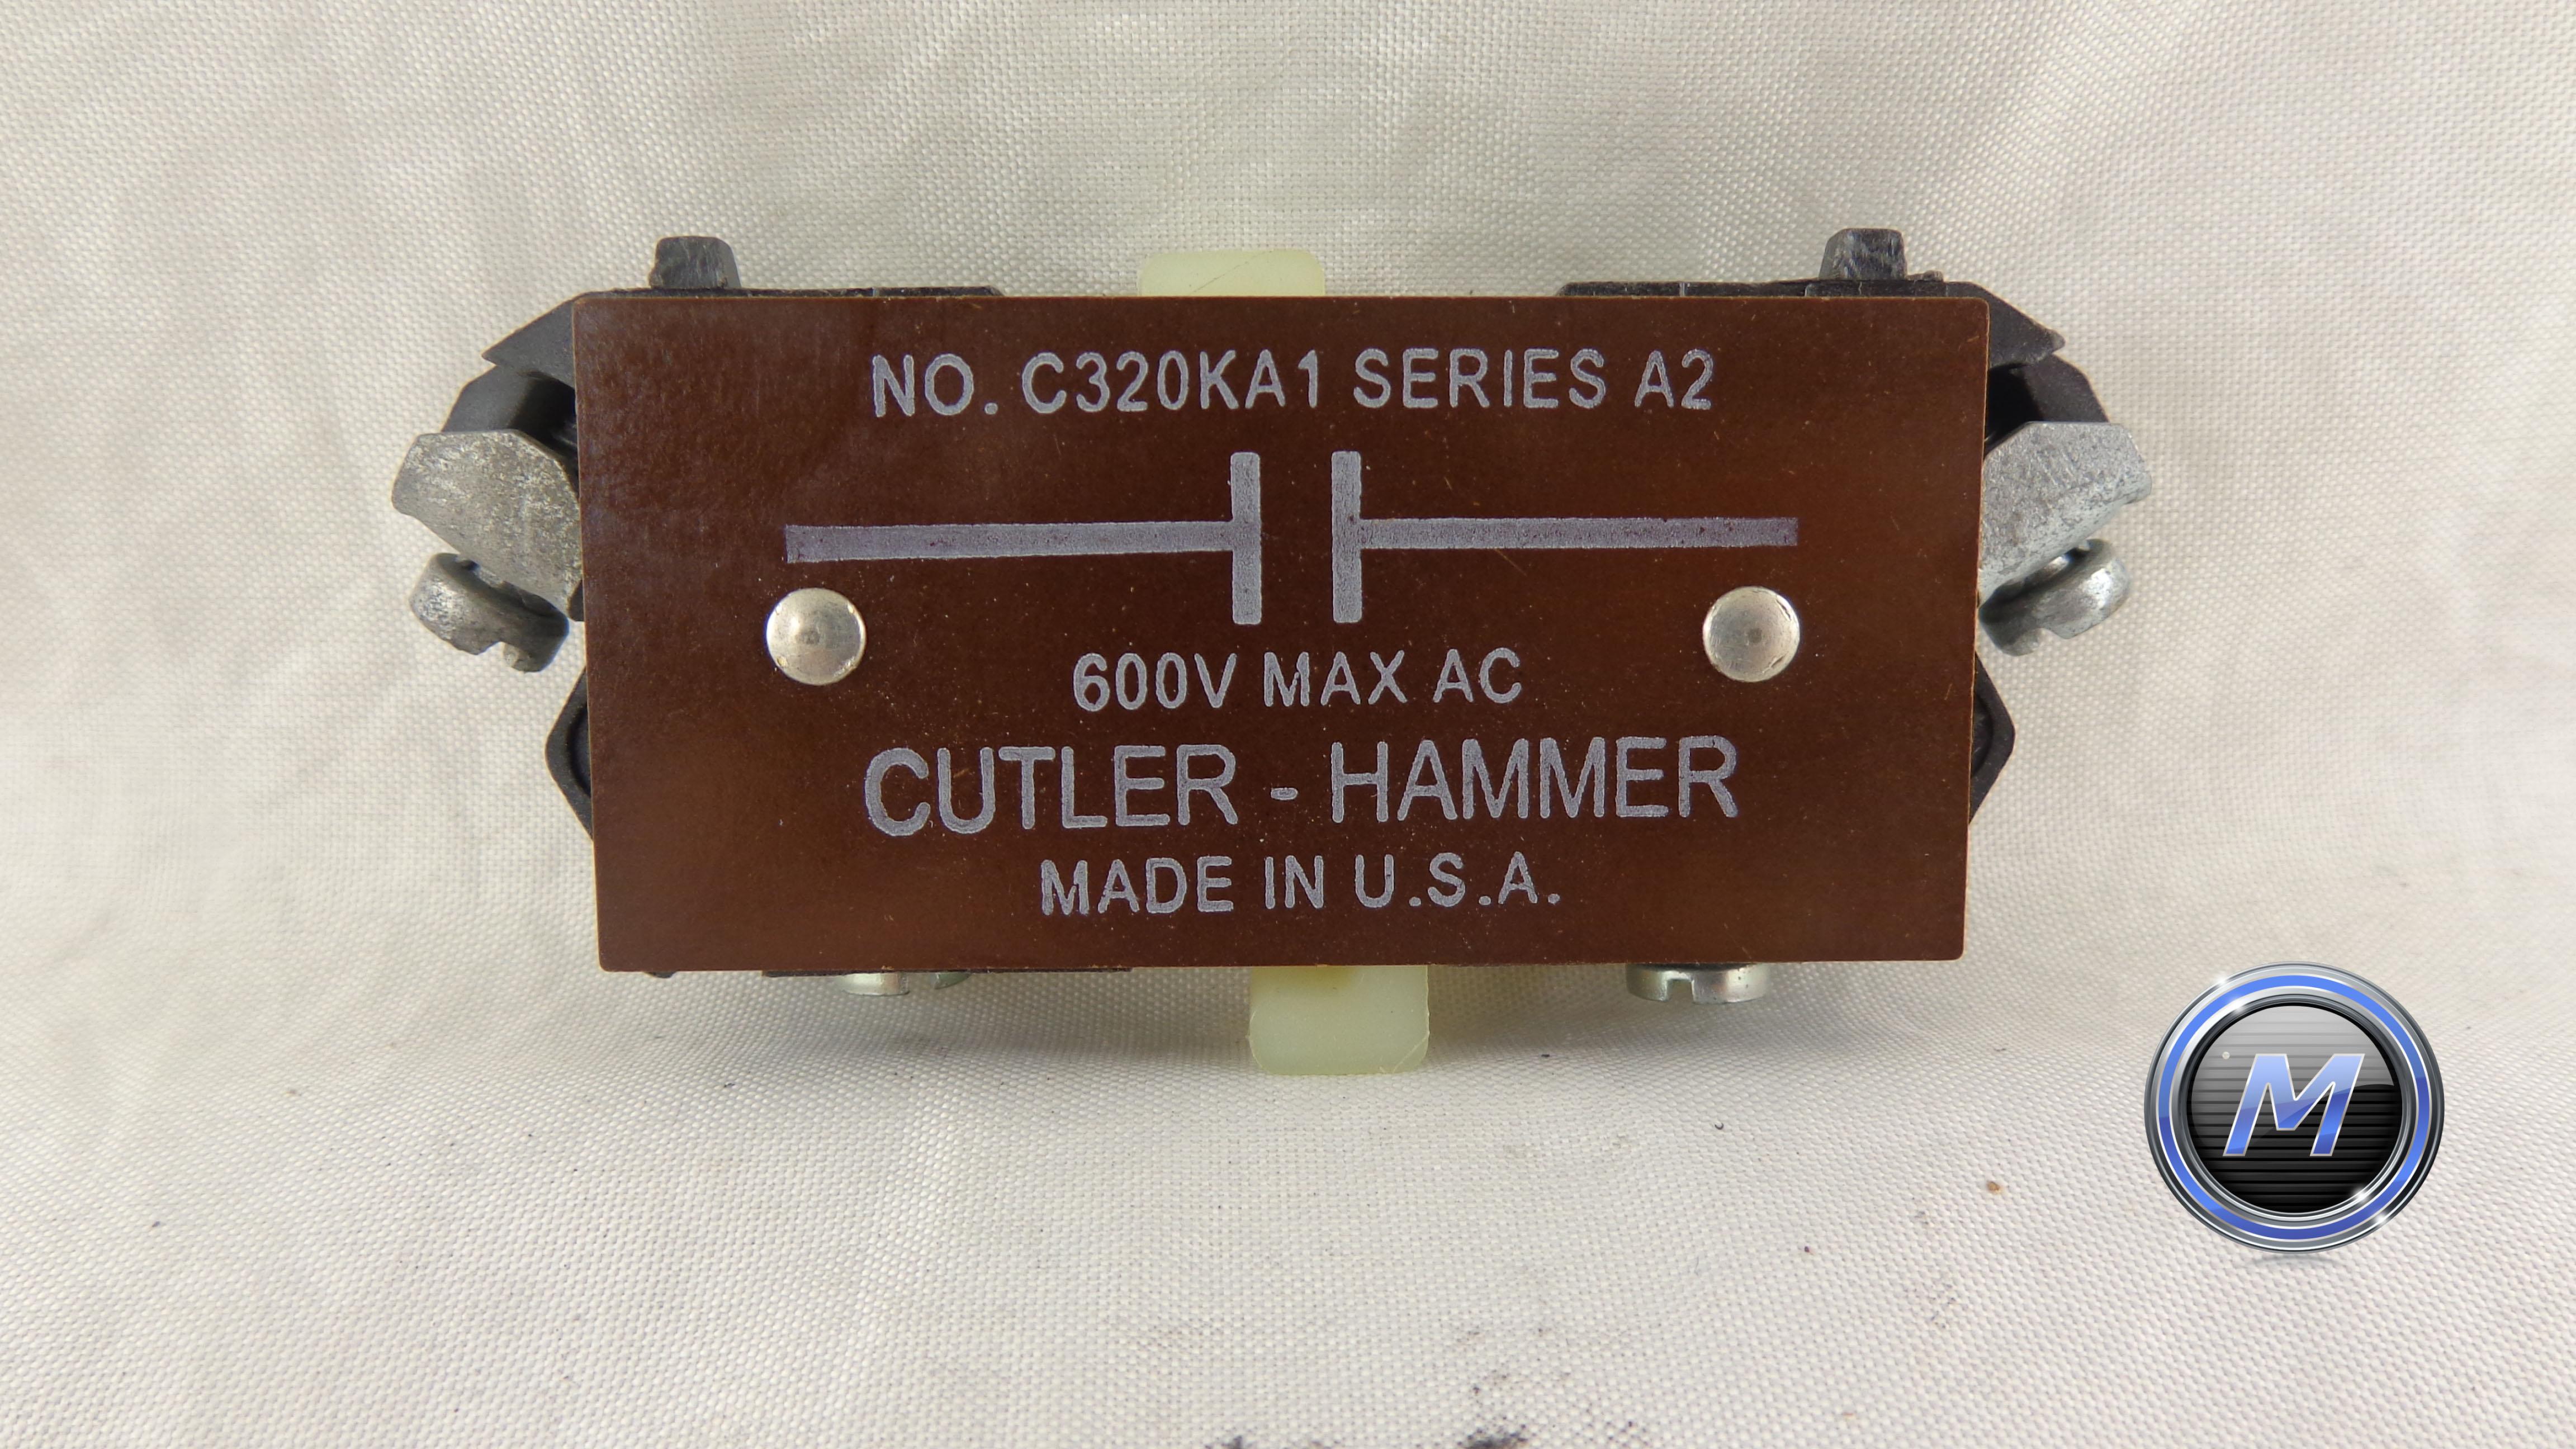 C320ka1 cutler hammer auxiliary contact block n o for Cutler hammer motor control centers